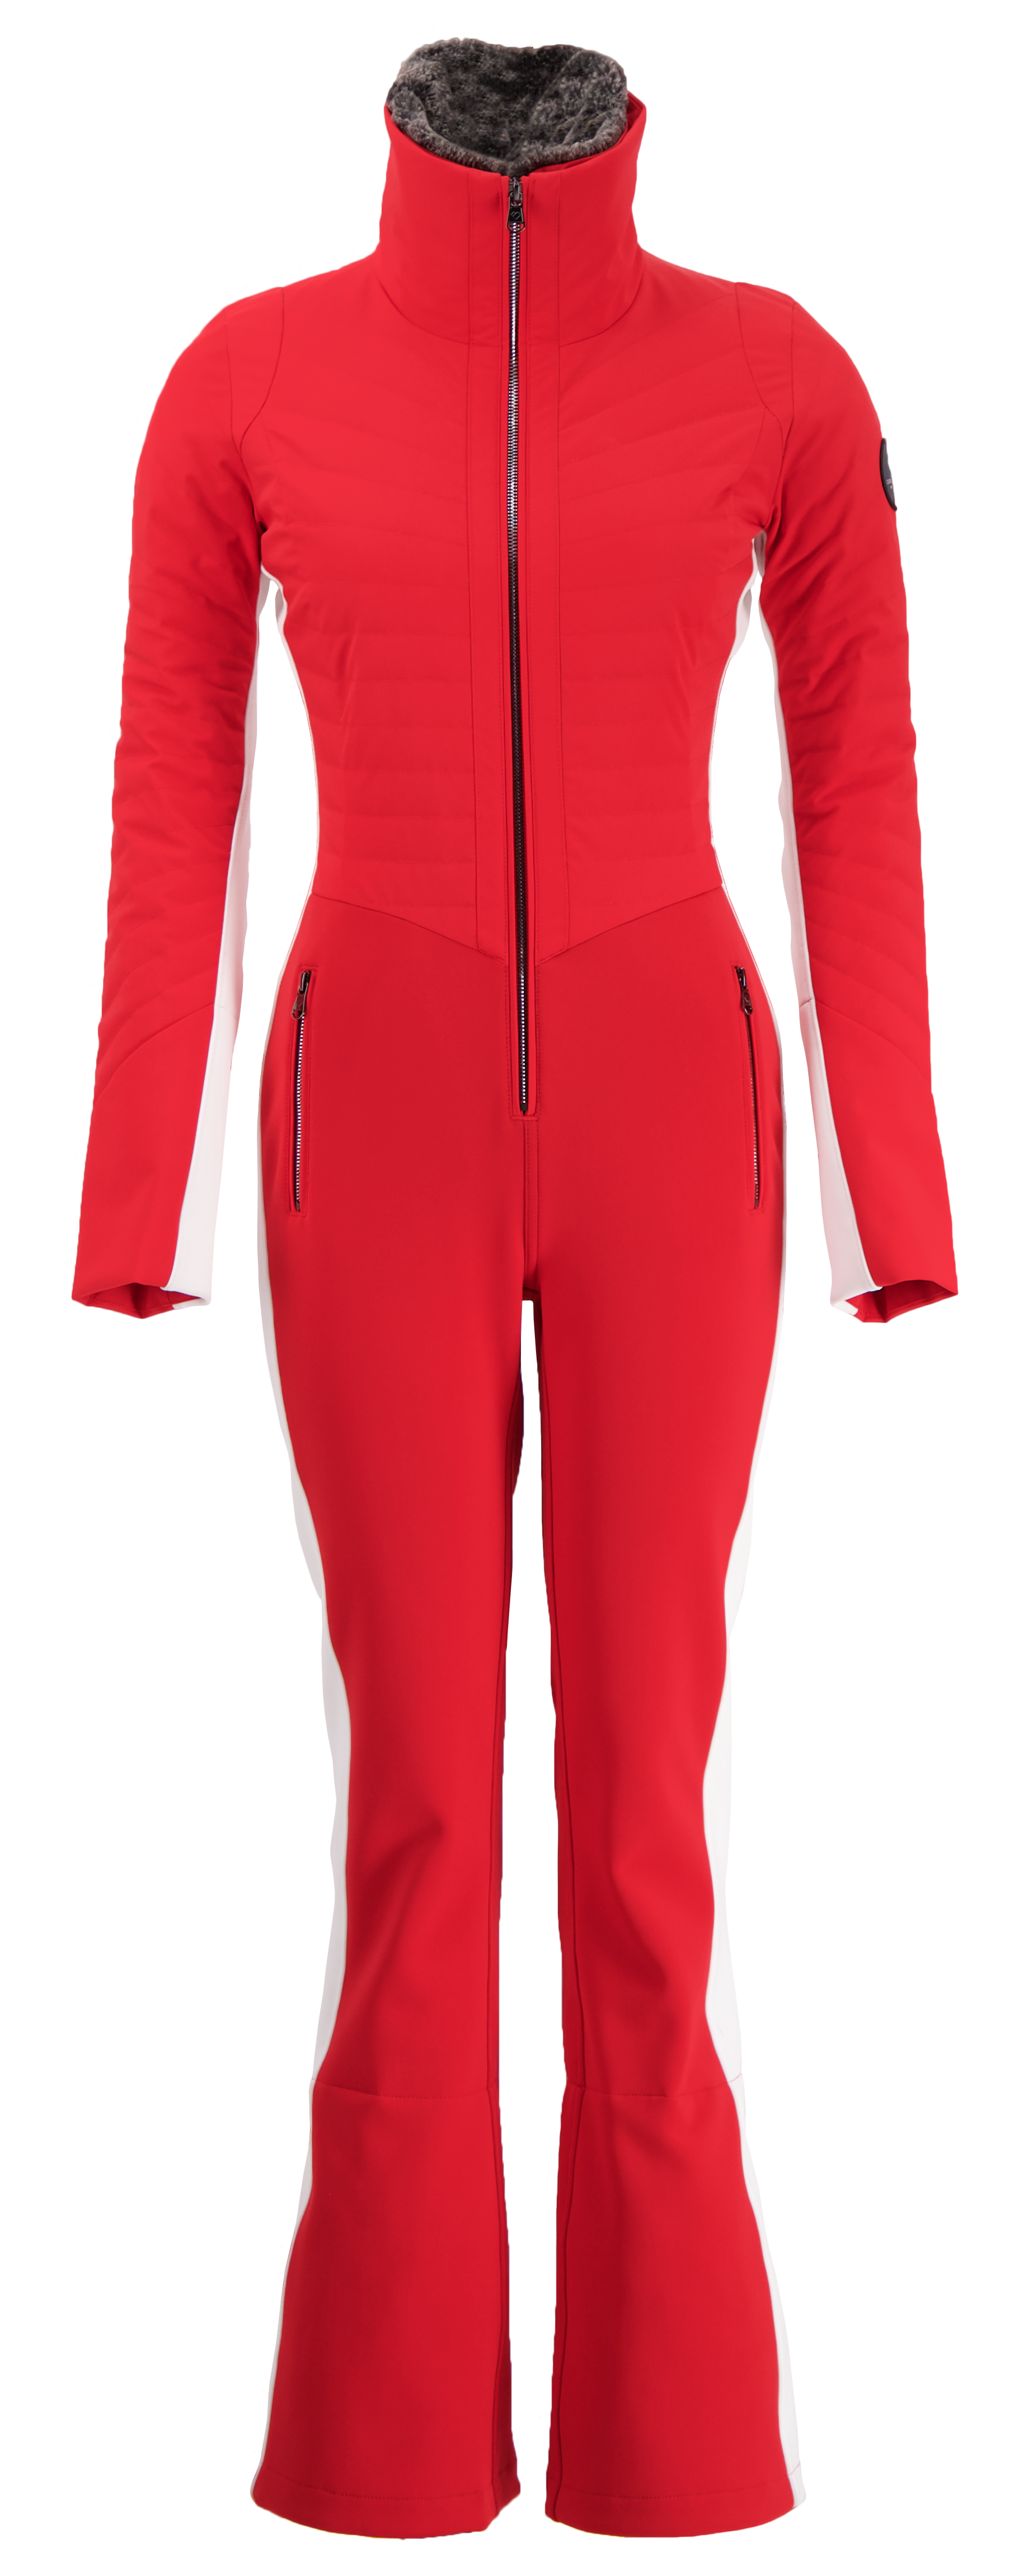 One-piece ski suit